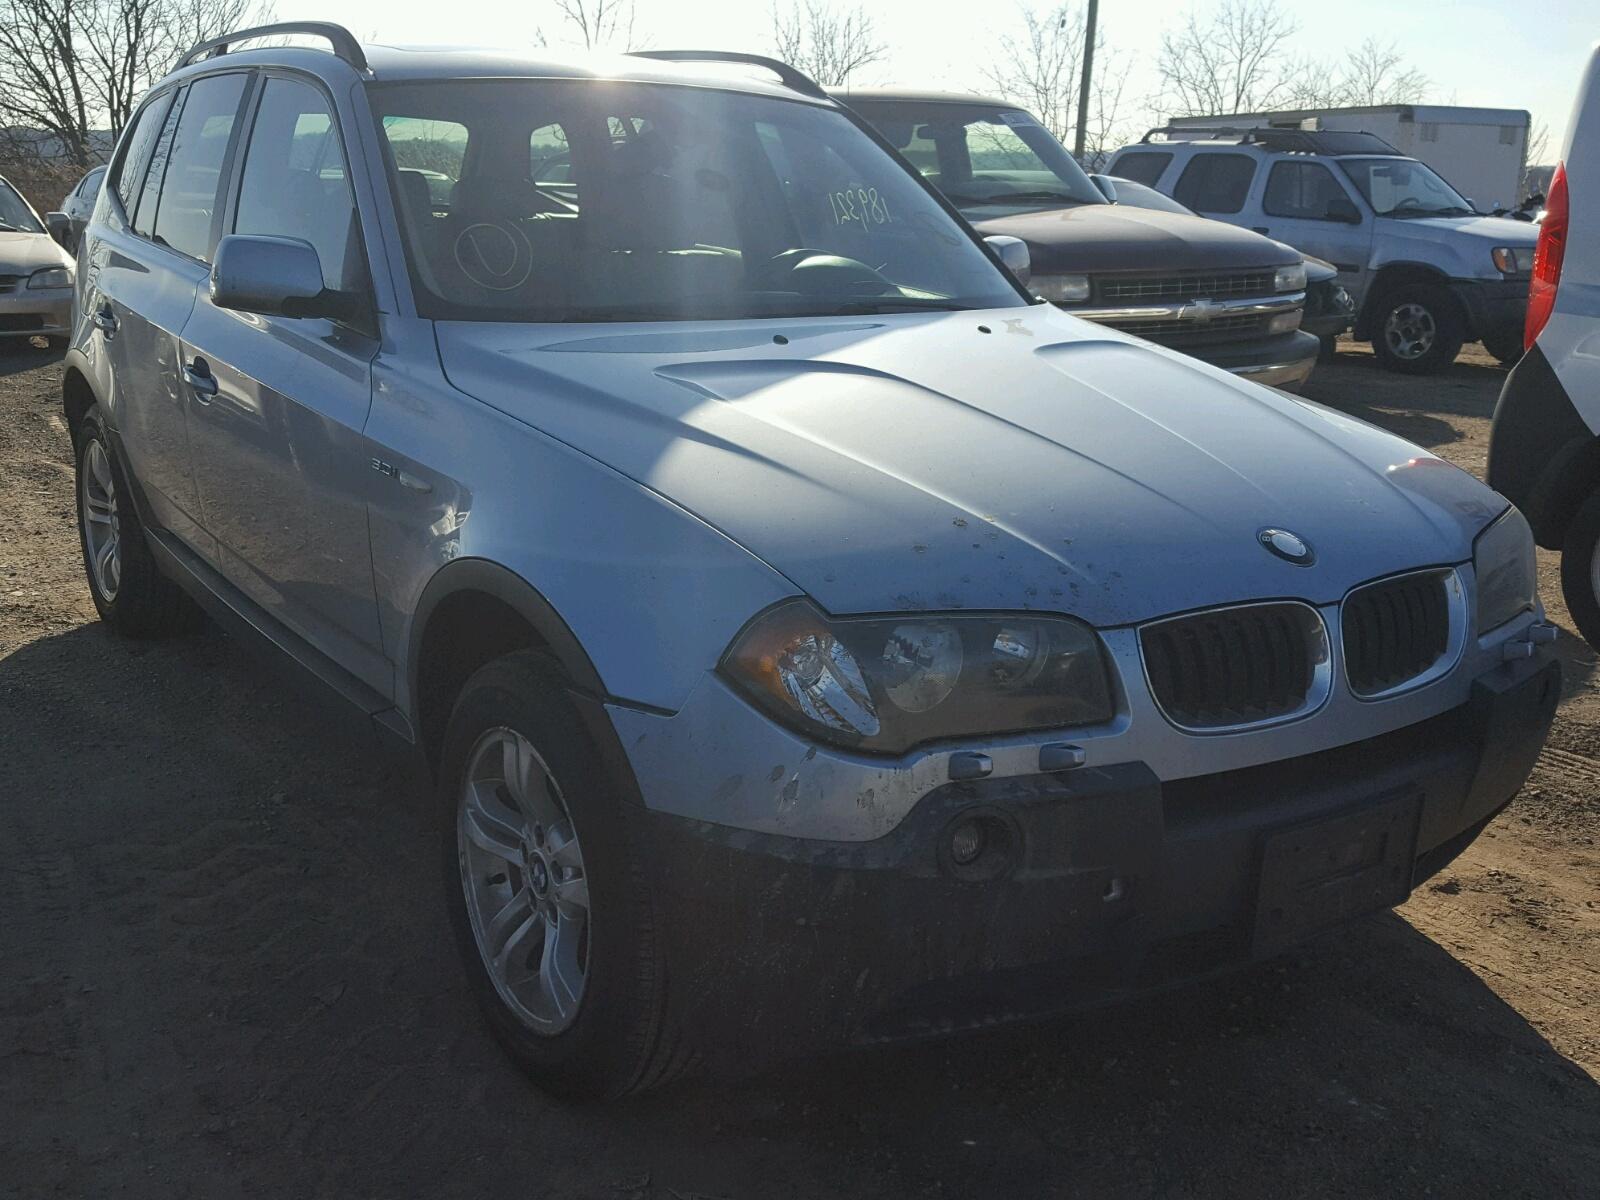 Salvaged BMW For Auction AutoBidMaster - 2012 bmw 745i